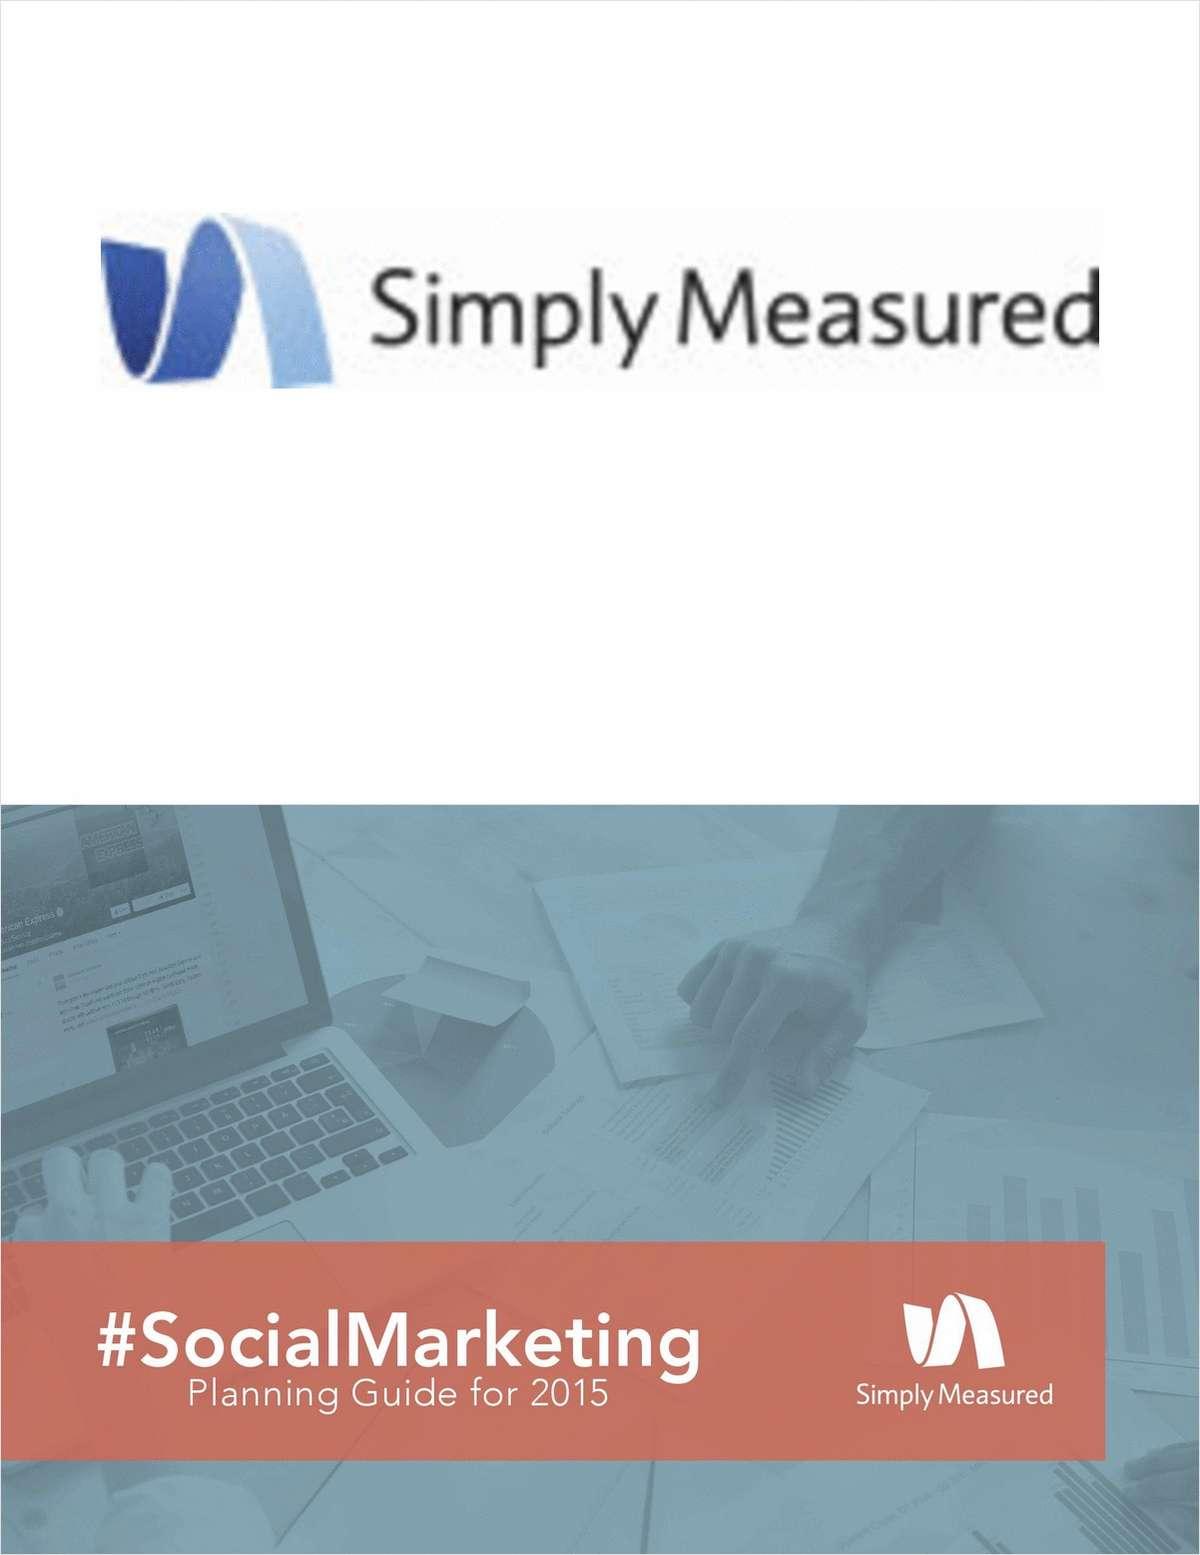 2015 Social Marketing Planning Guide